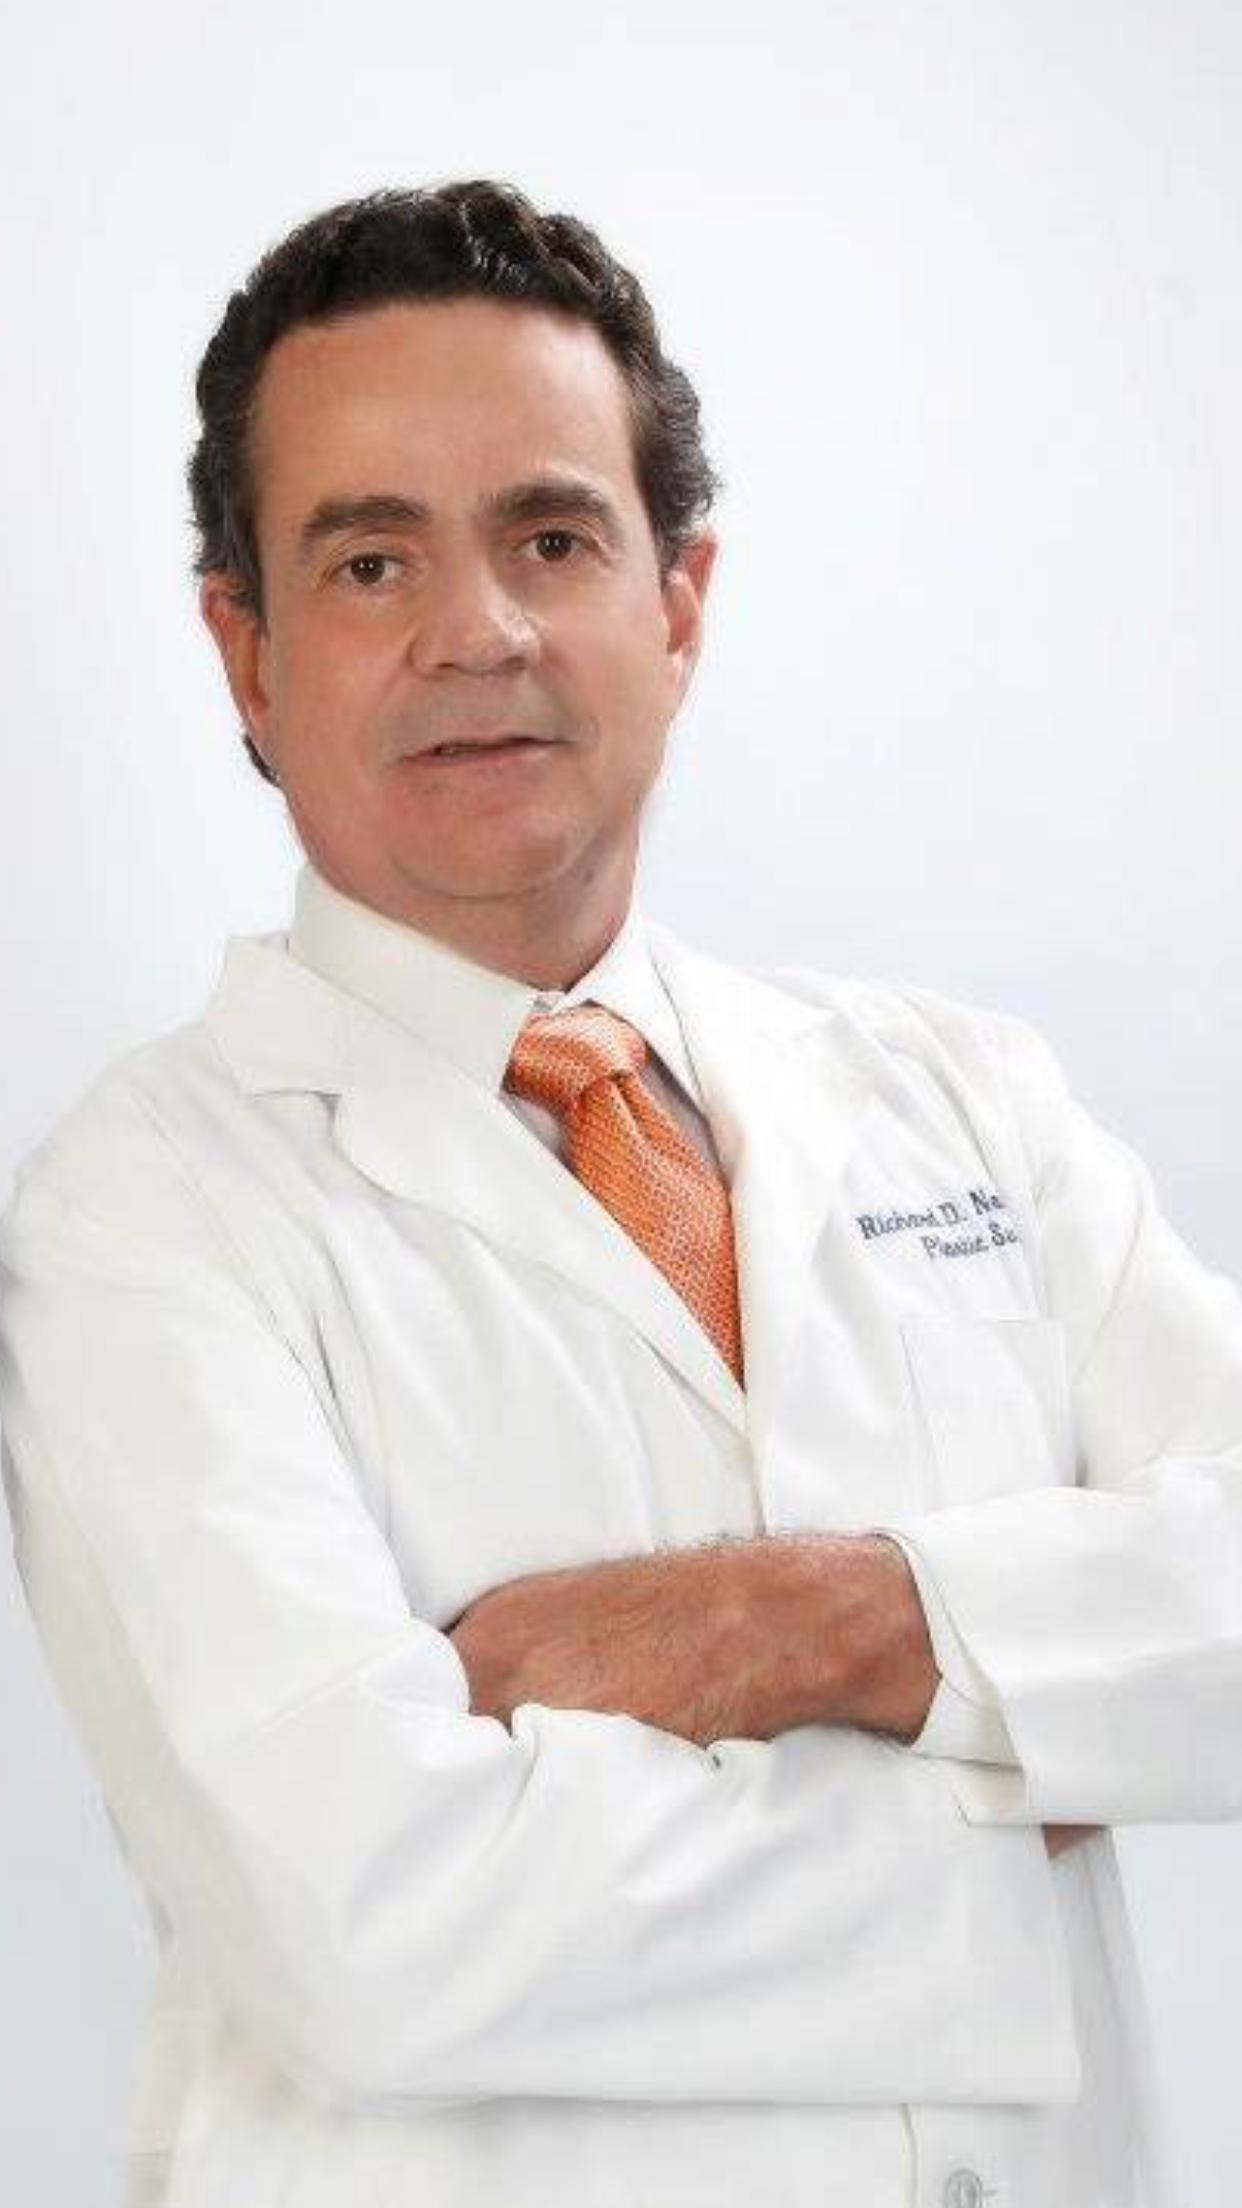 Richard Nadal, MD Plastic Surgery